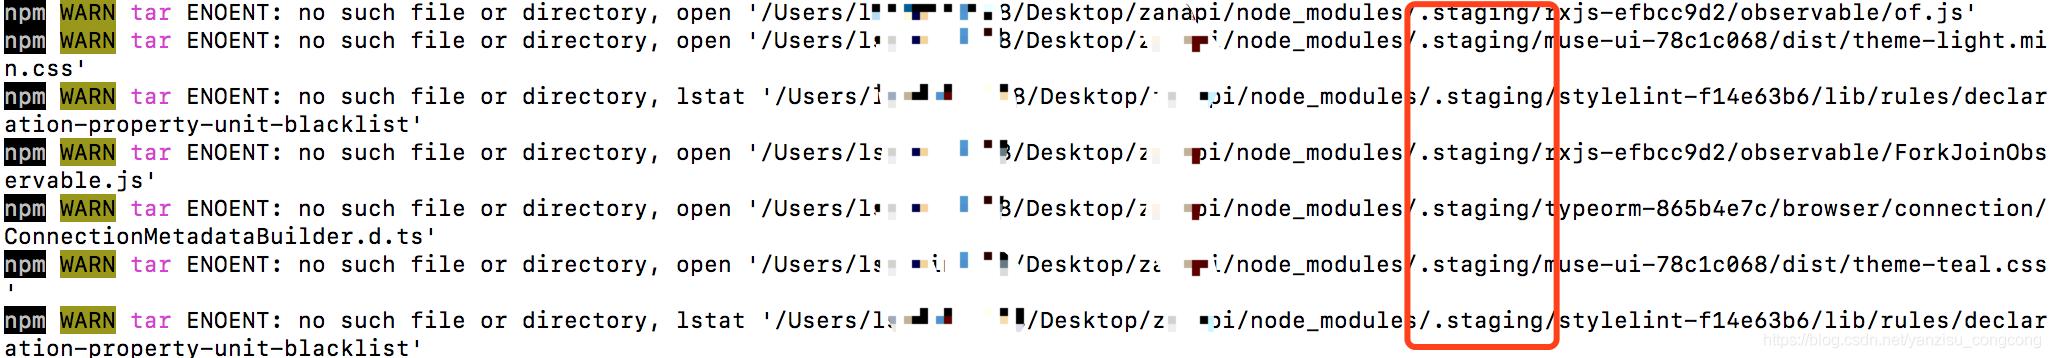 npm install 一直失败,出现以下npm WARN tar ENOENT: no such file or directory